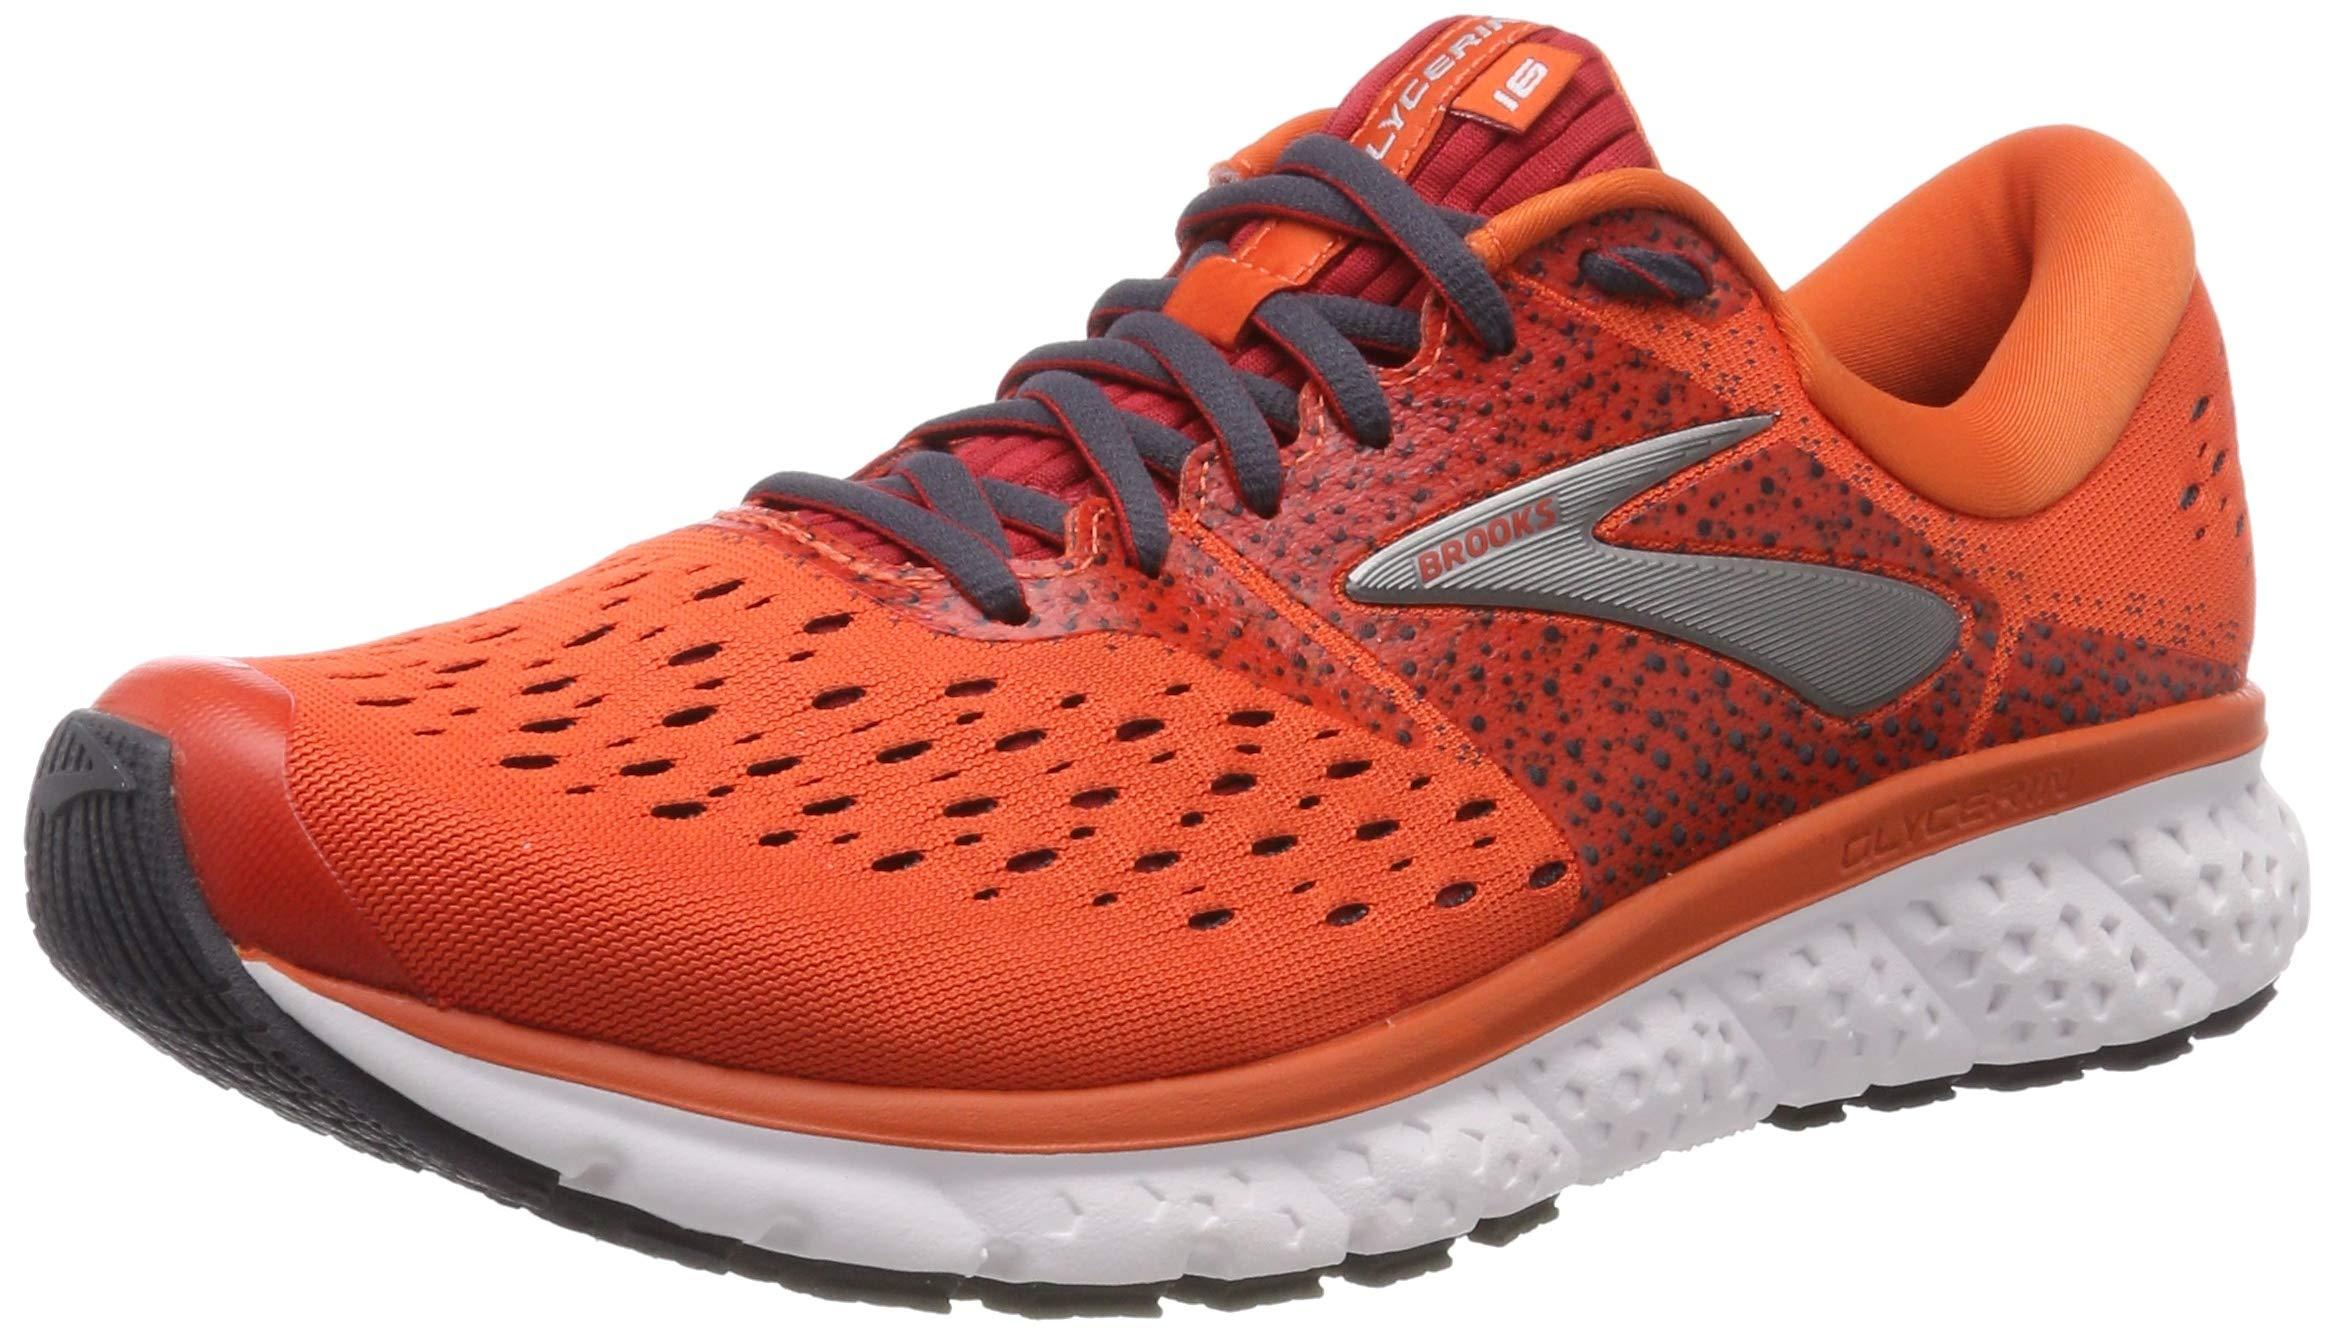 81KKriEo3qL - Brooks Men's Glycerin 16 Running Shoes